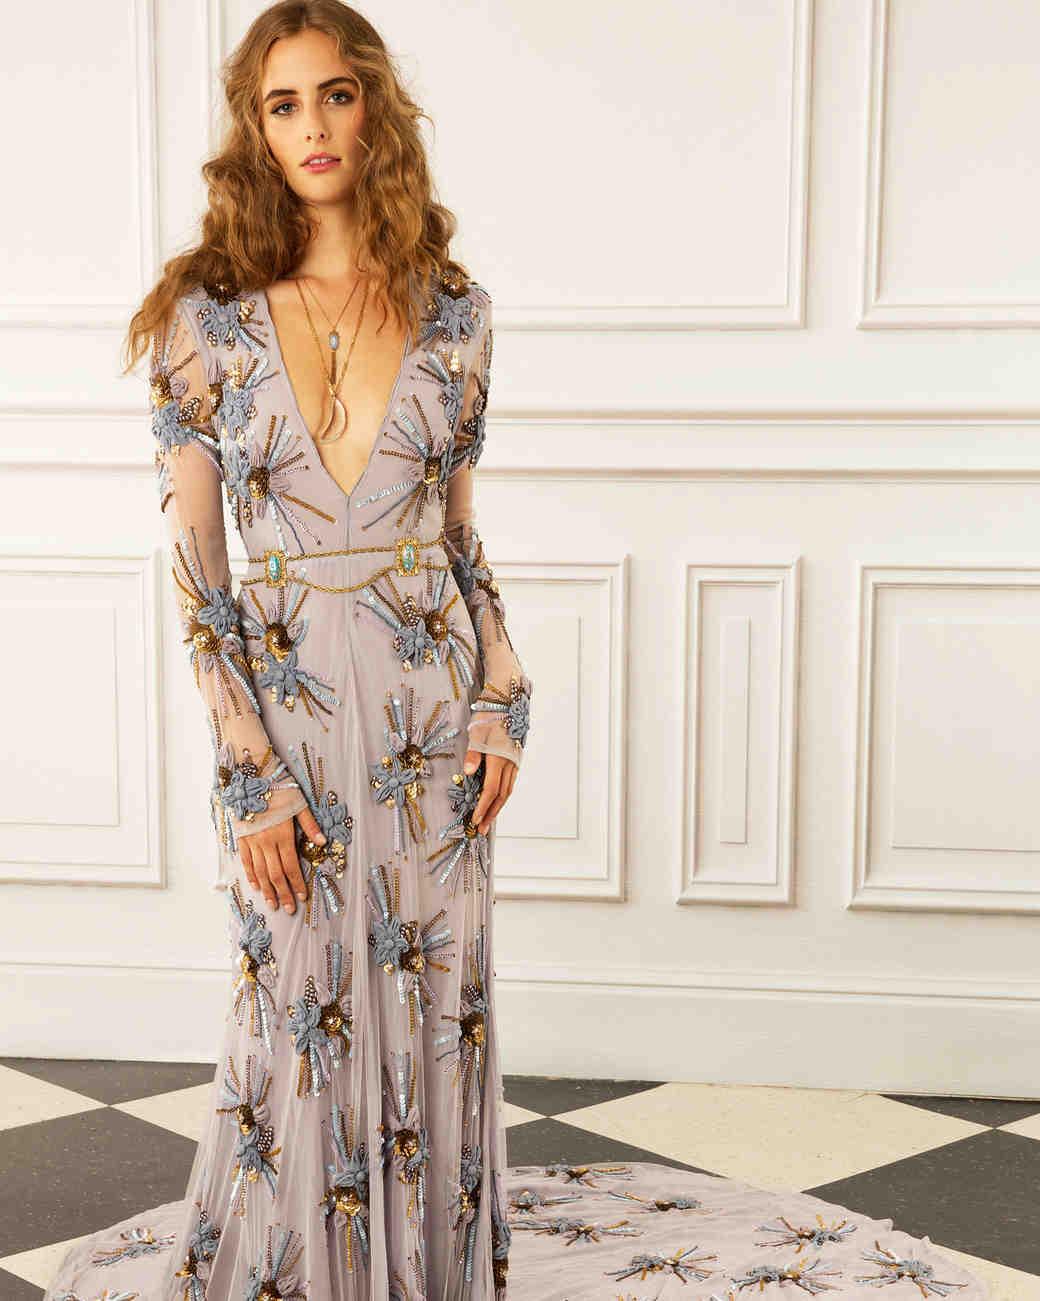 maria korovilas wedding dress spring 2017 deep v long sleeves pattern